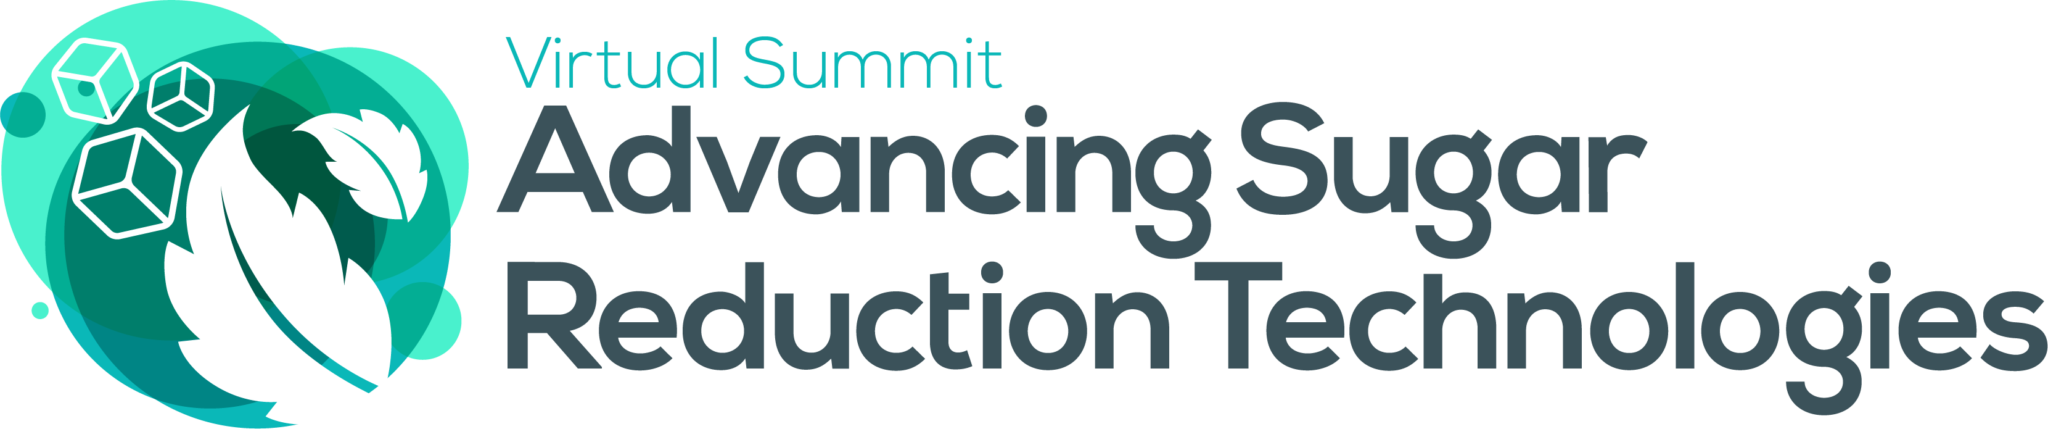 Advancing-Sugar-Reduction-Technologies-Summit-logo